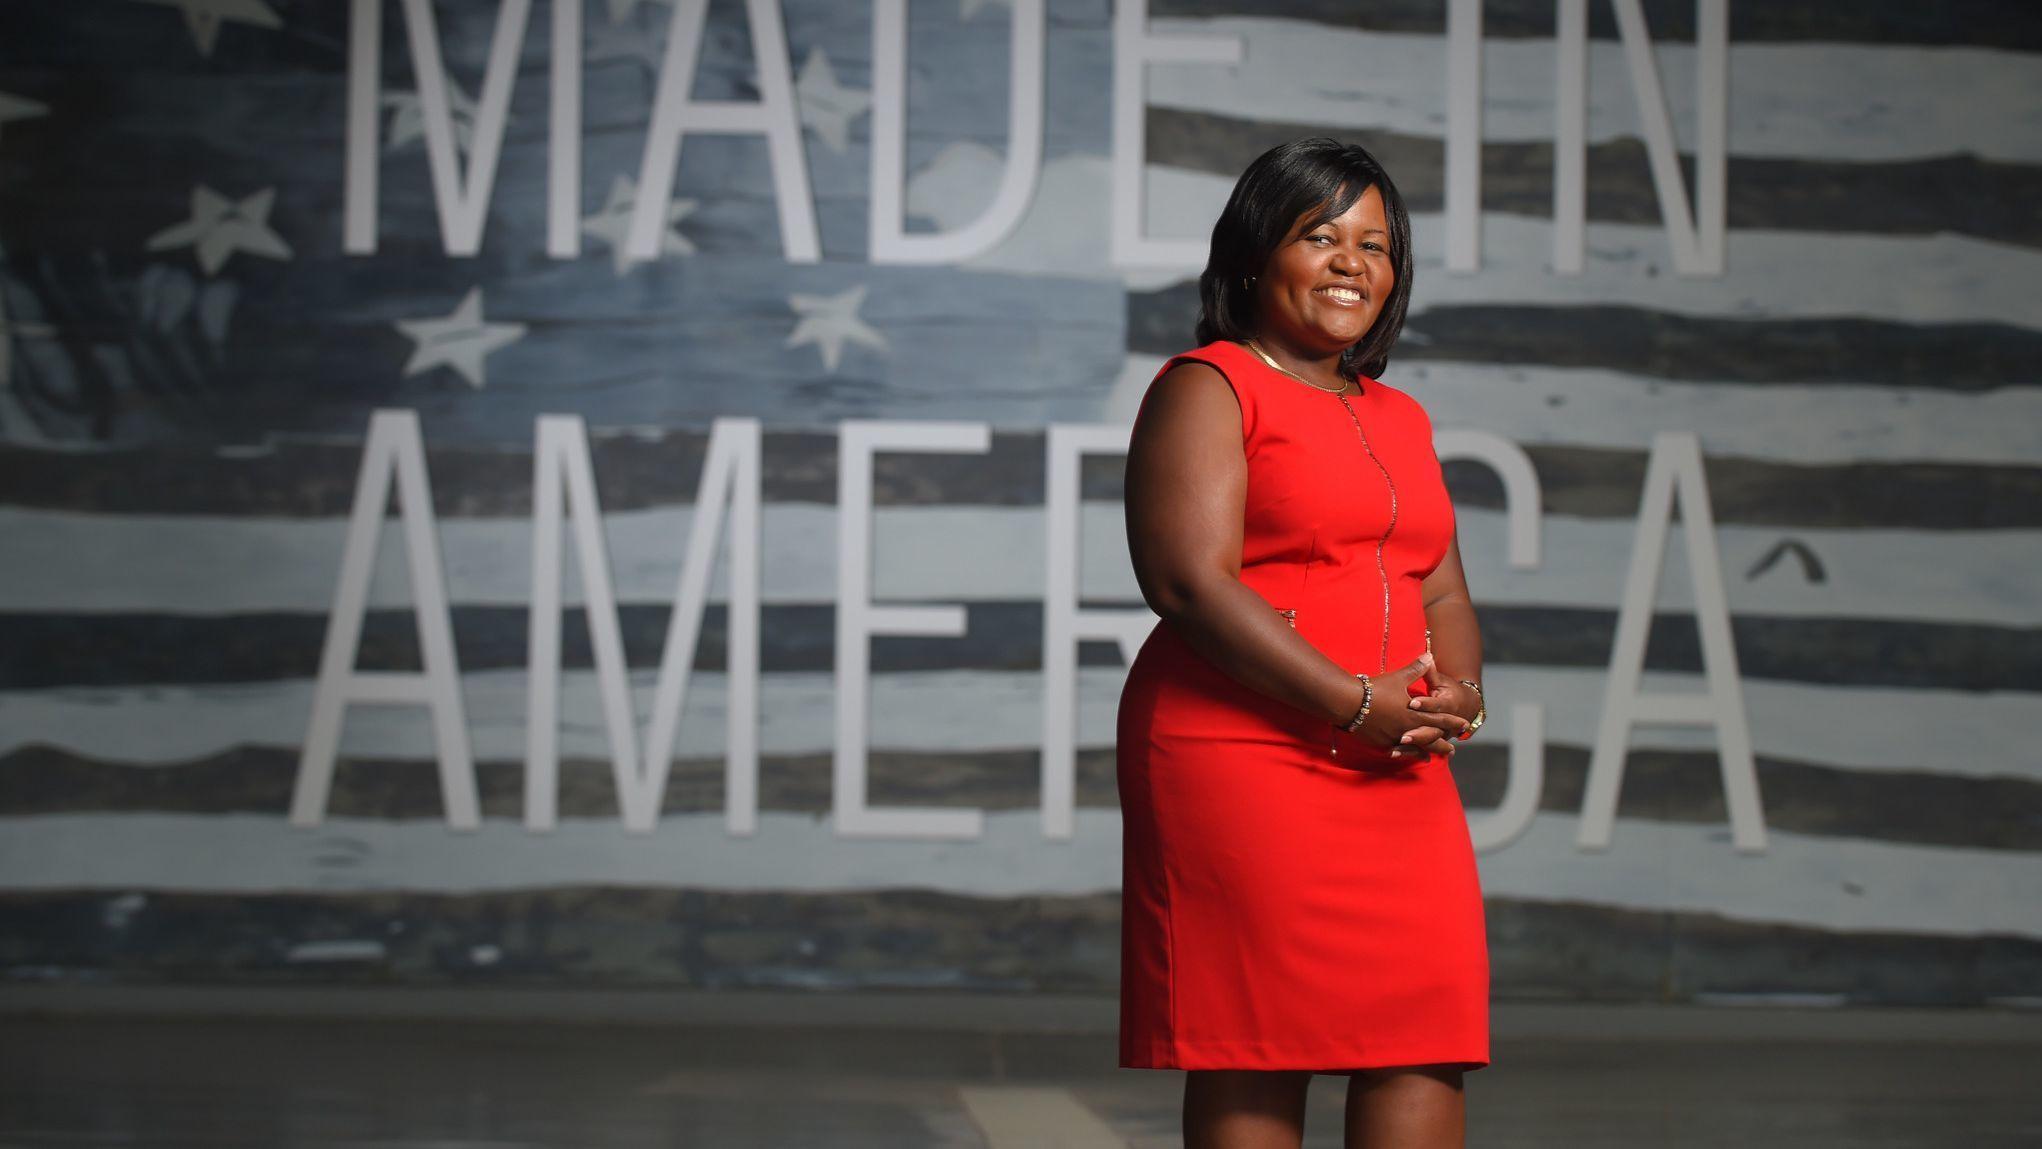 She bridged neighborhoods and Sagamore for Port Covington deal. Can she do the same for Hopkins?